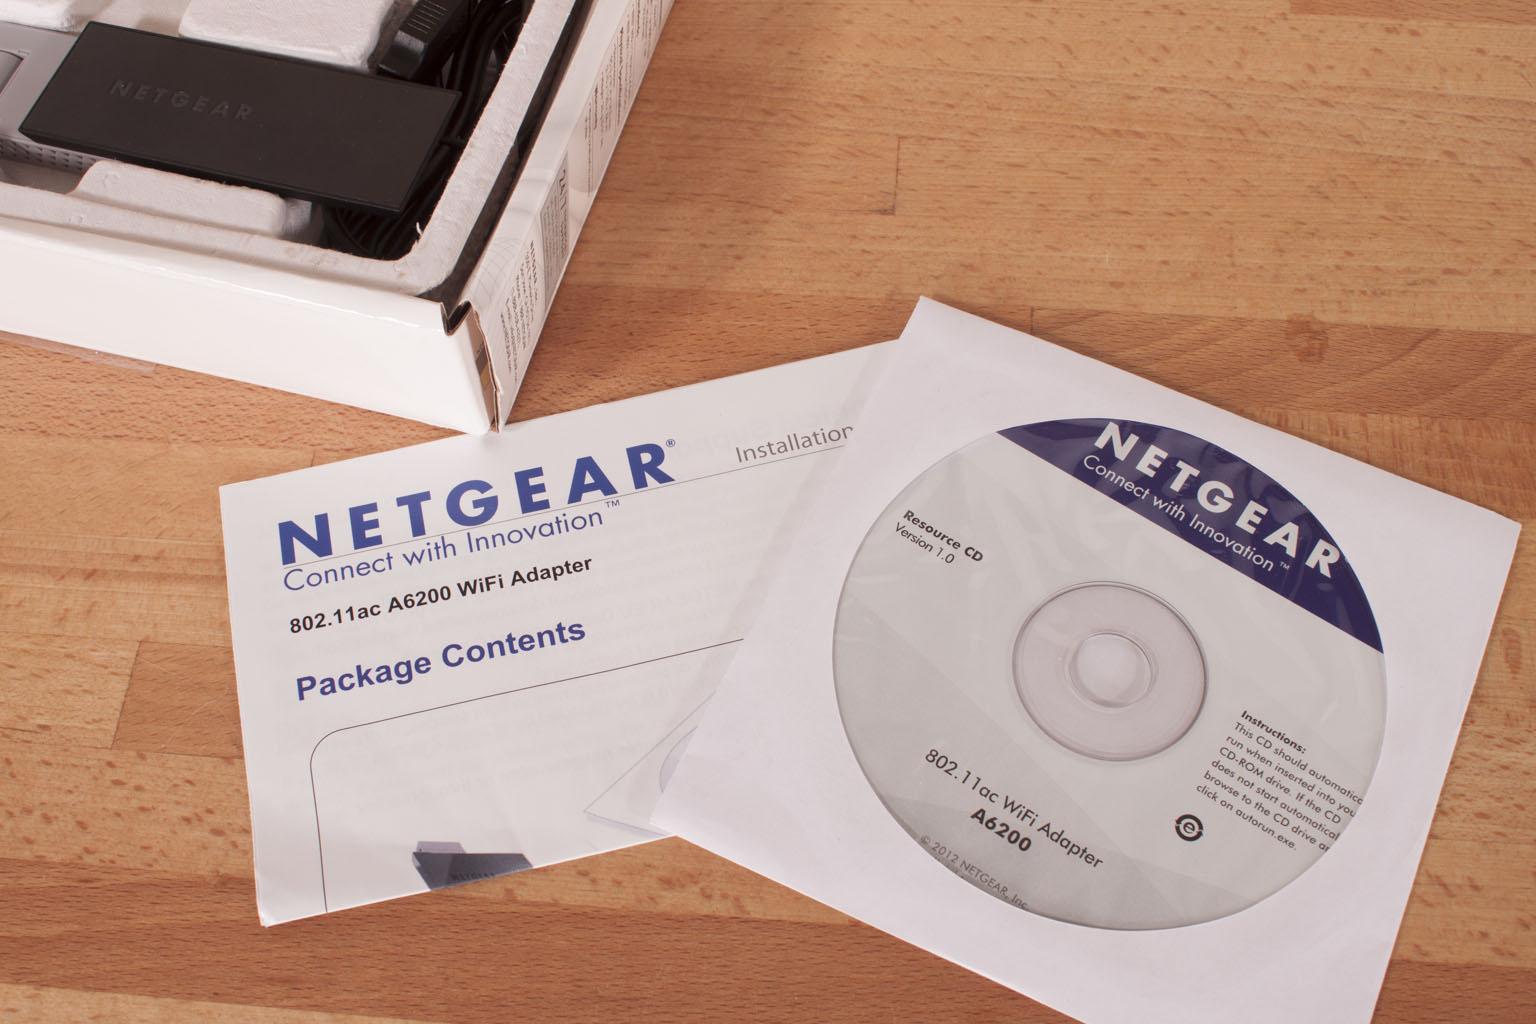 NETGEAR 802 11ac A6200 USB WiFi Adapter Runs Through The Lab